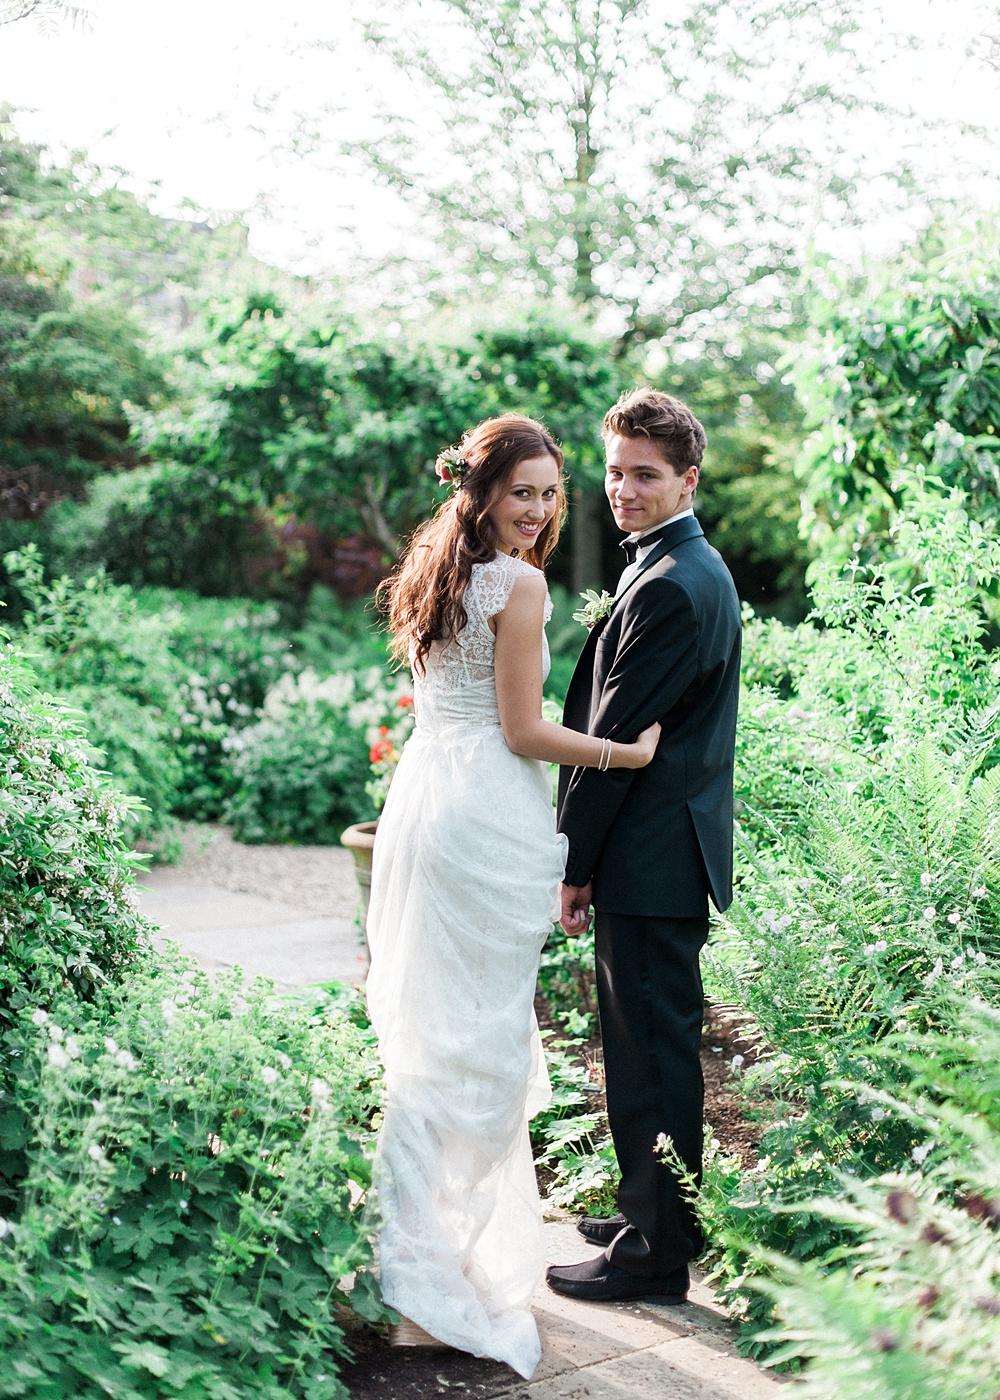 country wedding-charlotte munro wedding styling-wickham house-kate nielen_0089.jpg